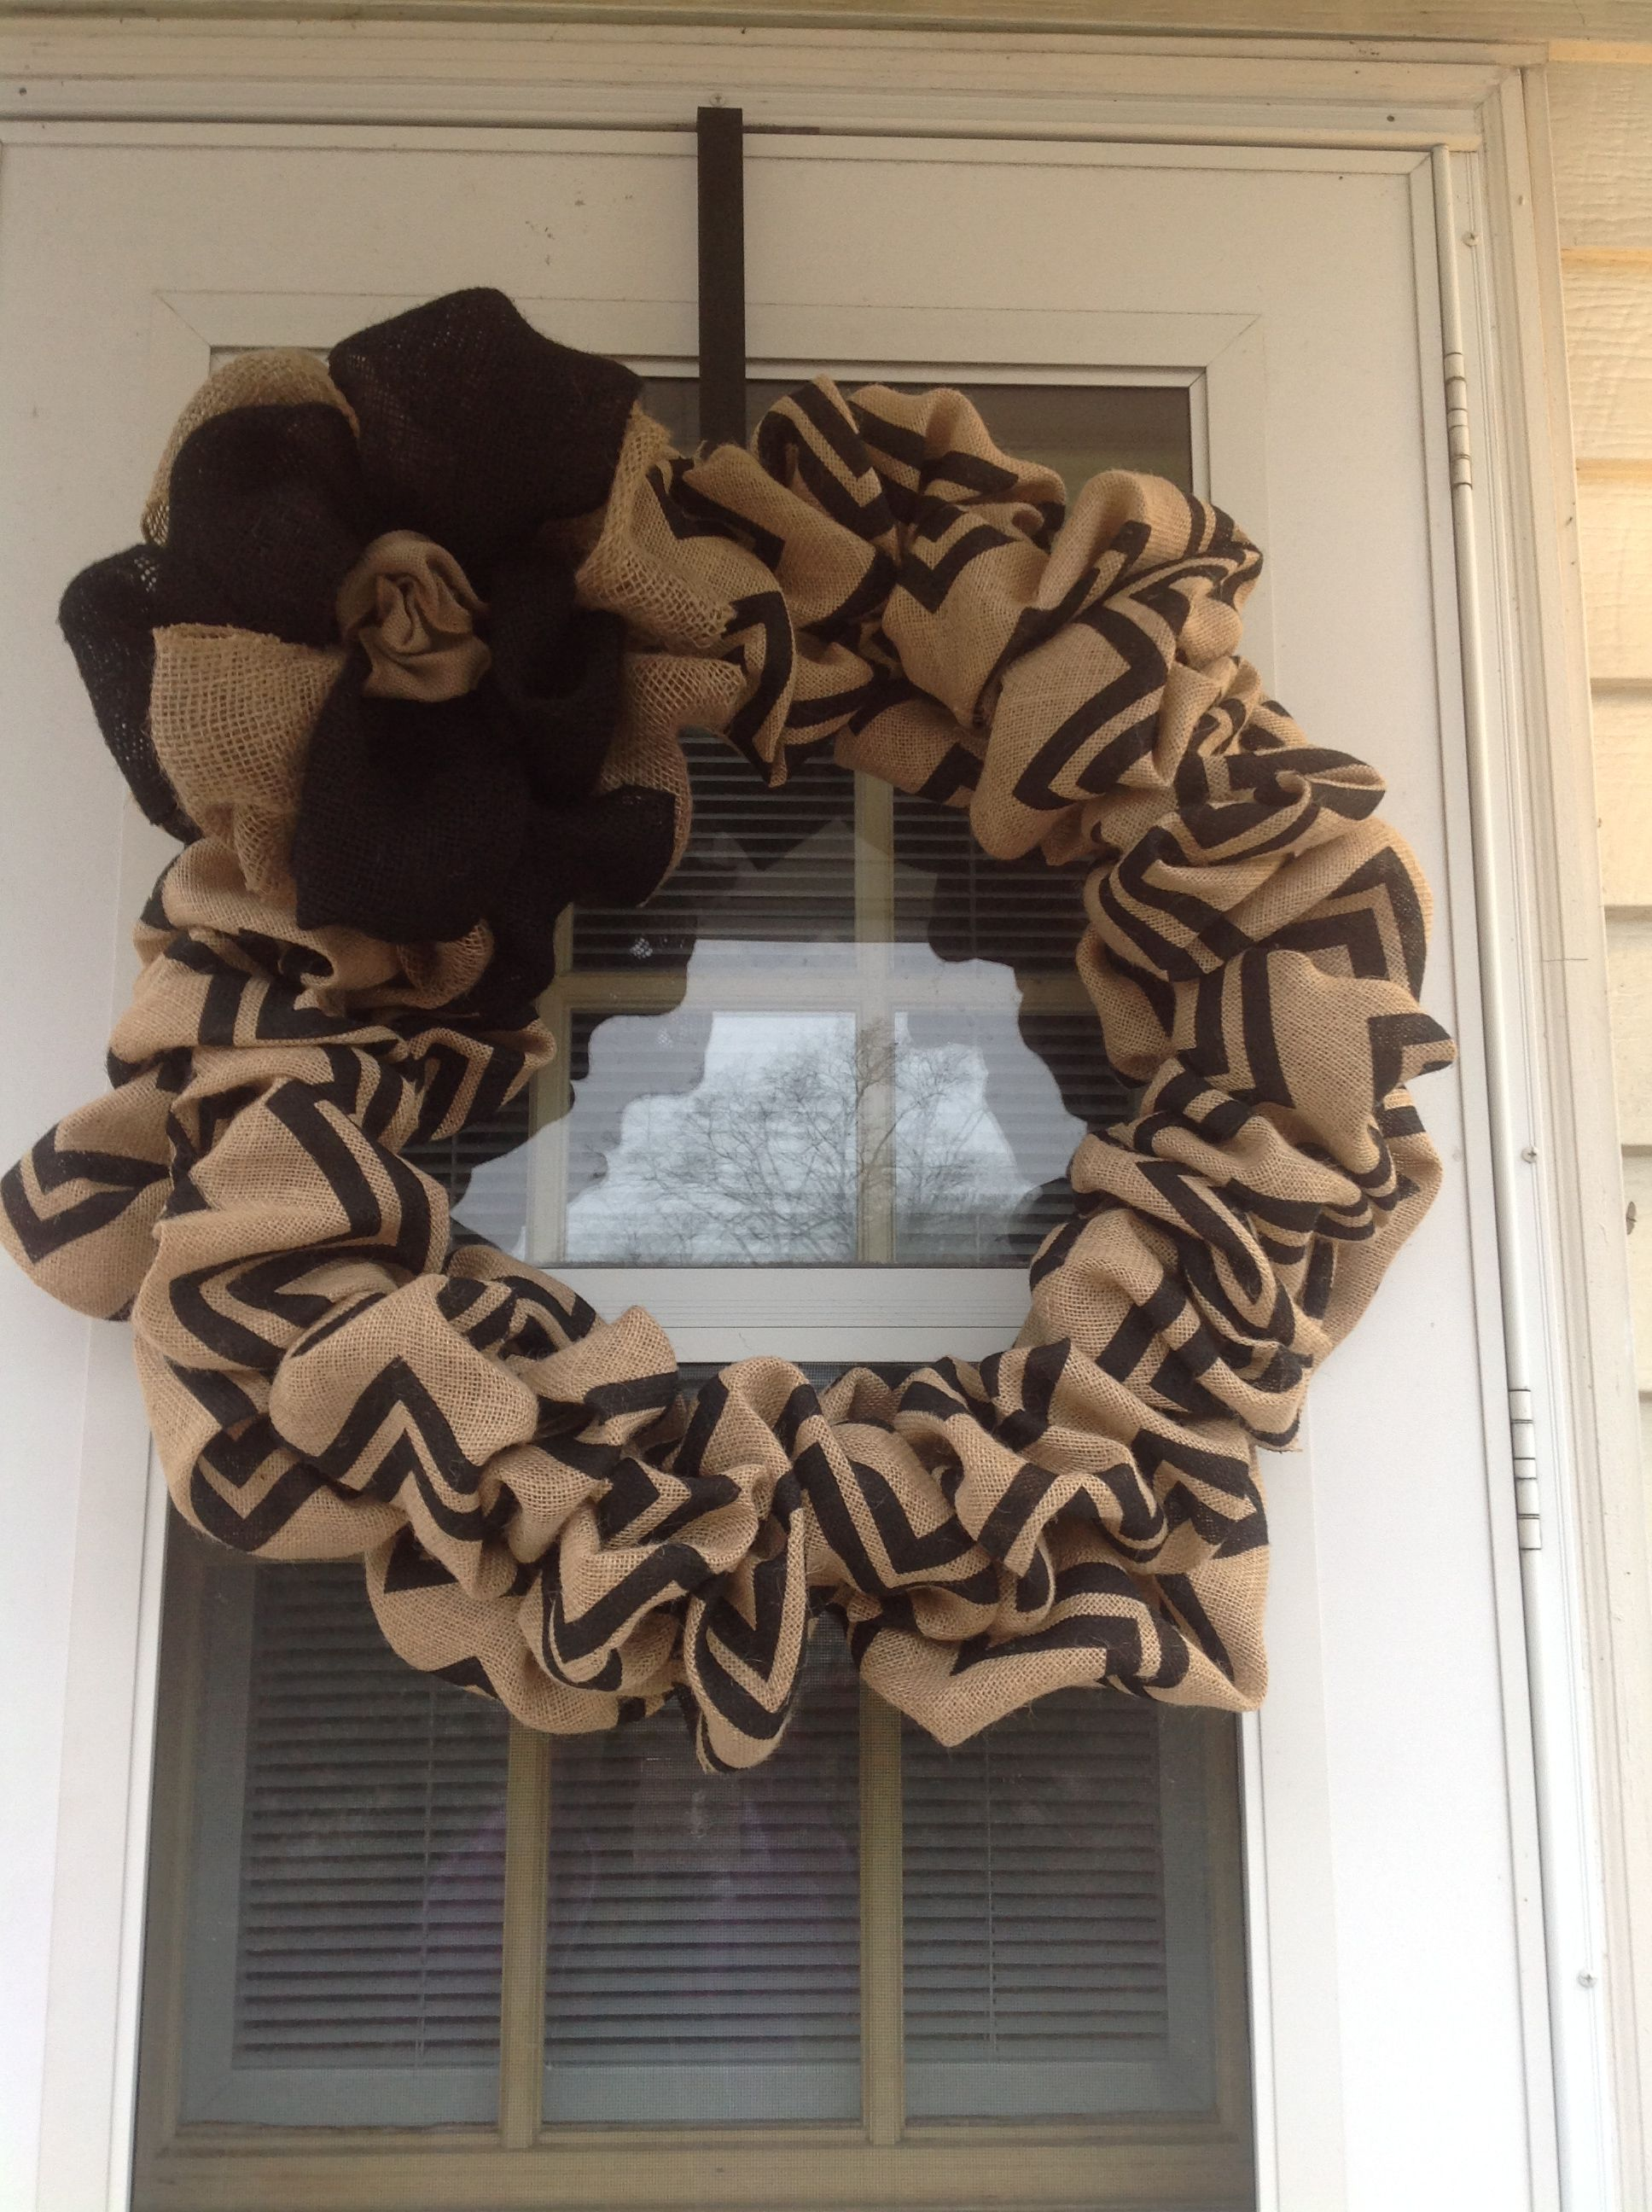 Chevron burlap wreath I just made.